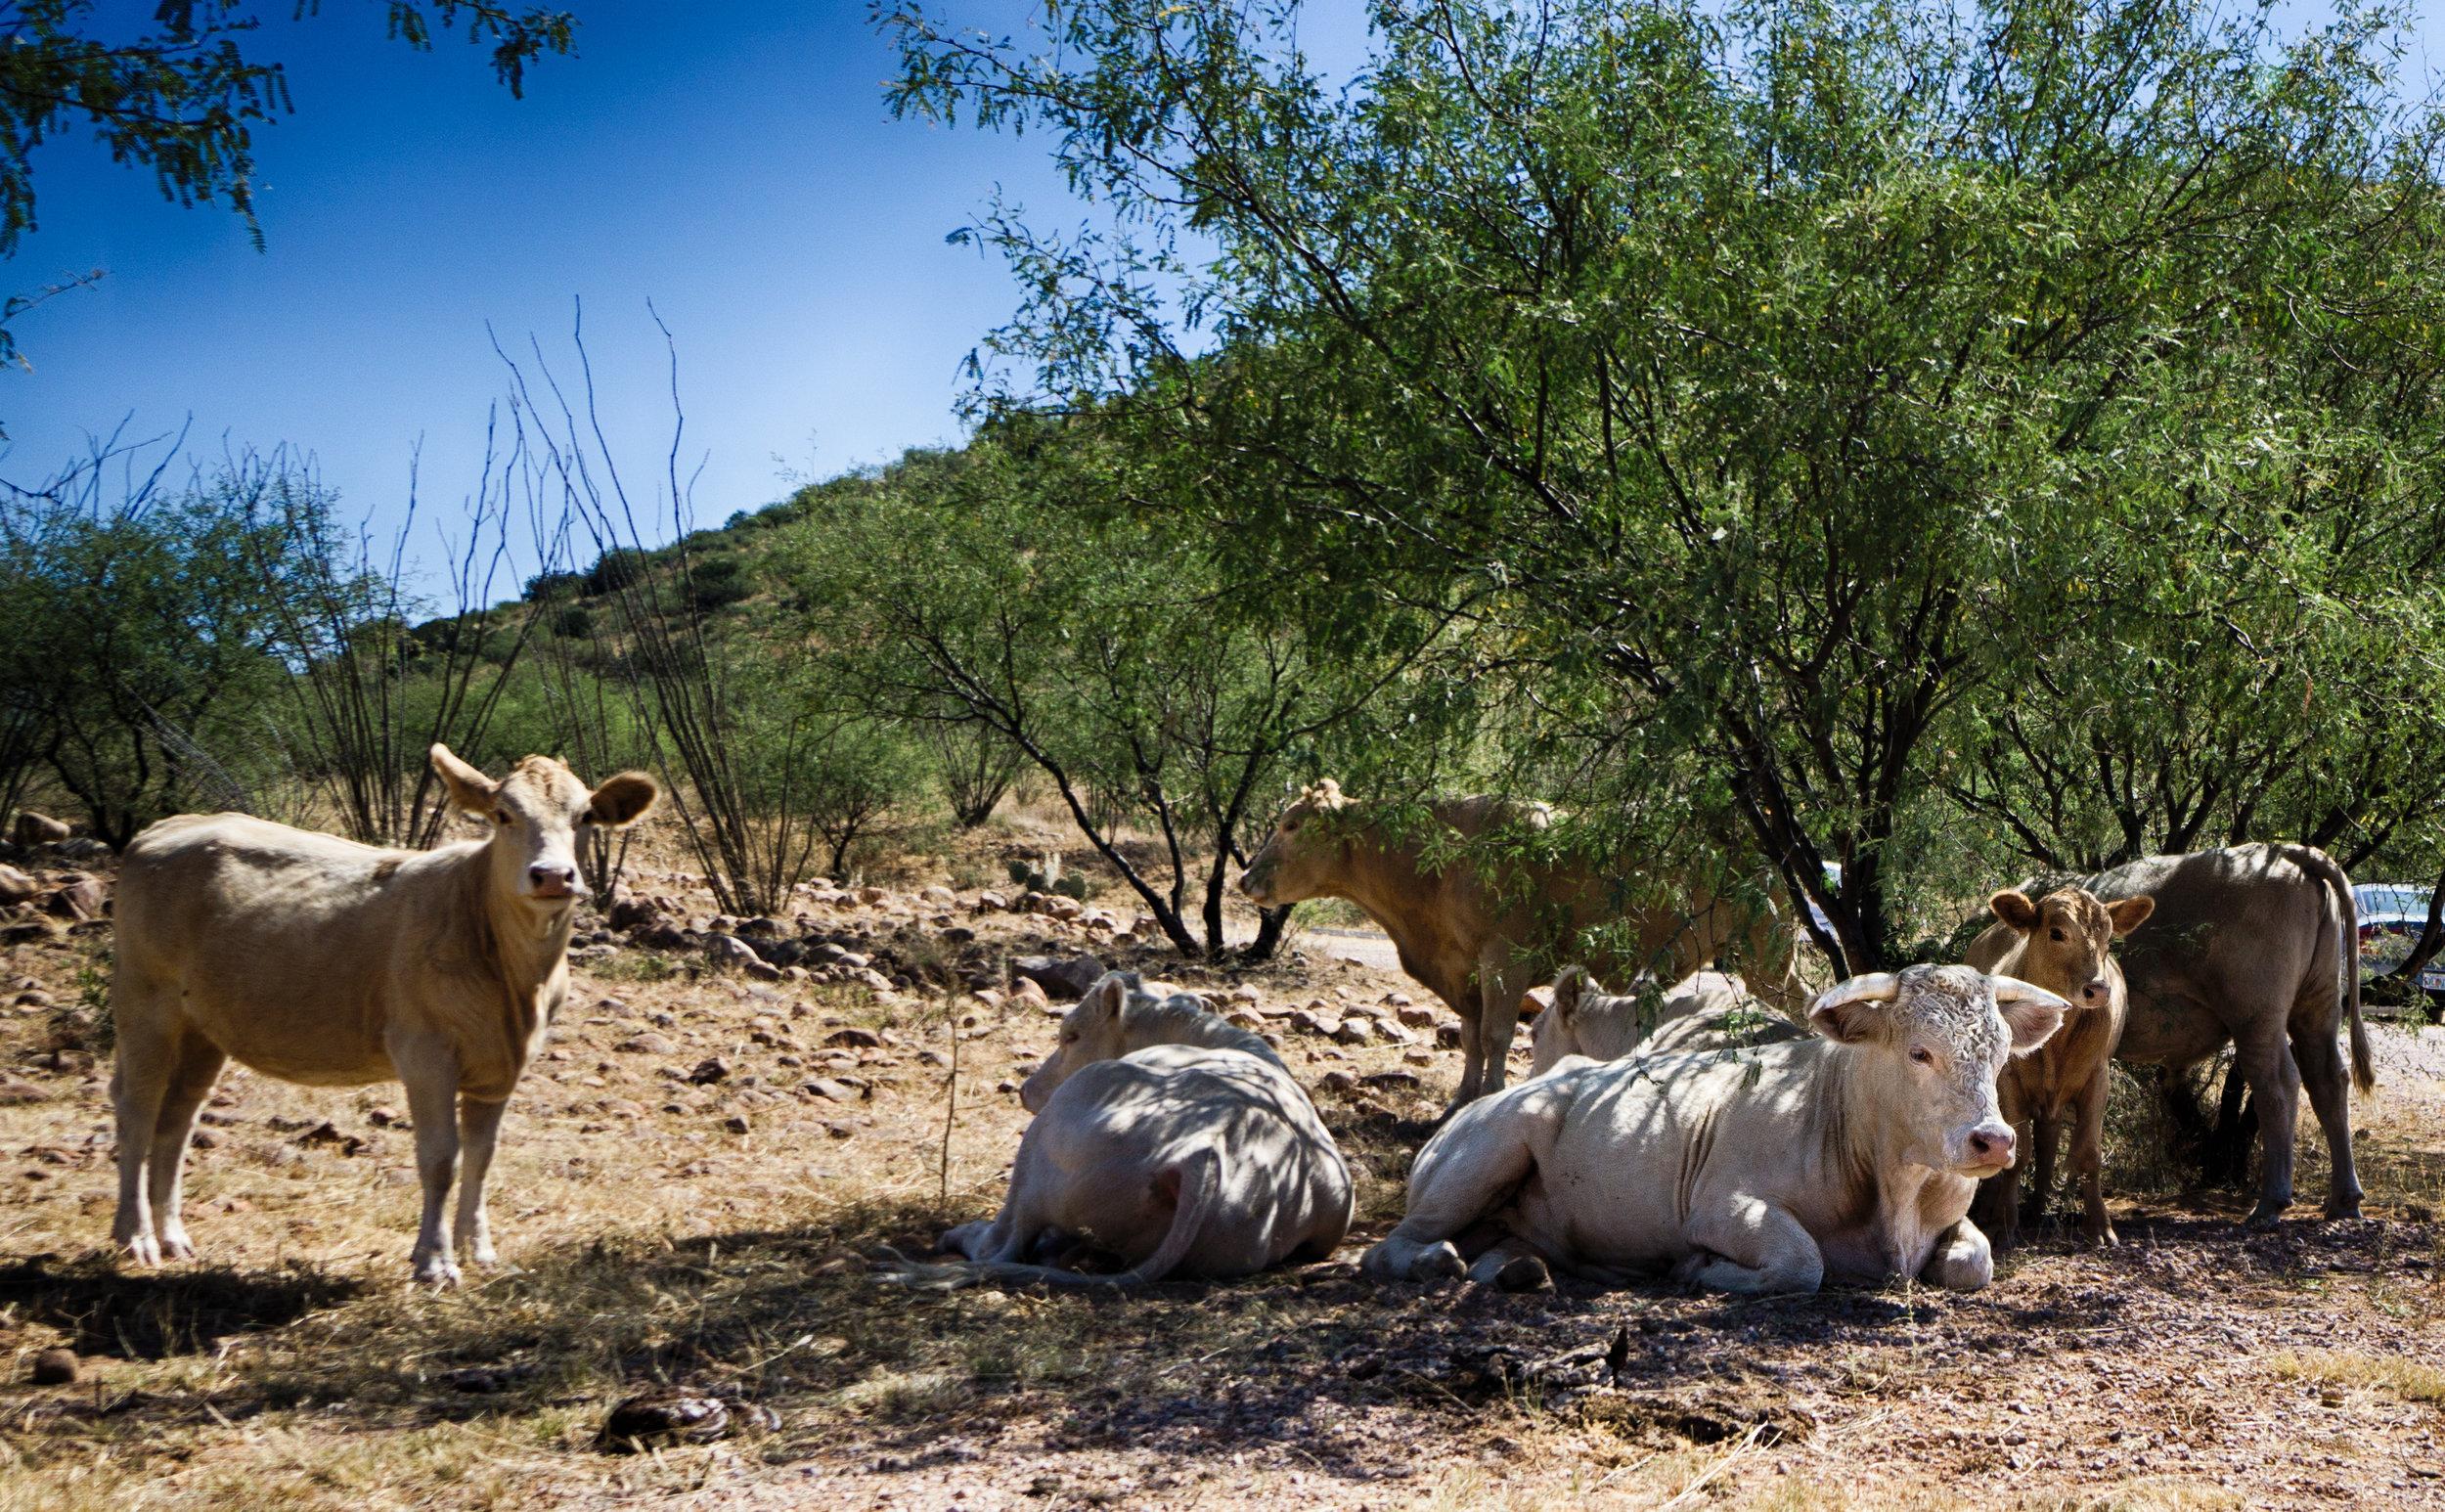 vickygood_photography_nature_arizona_cattle3.jpg